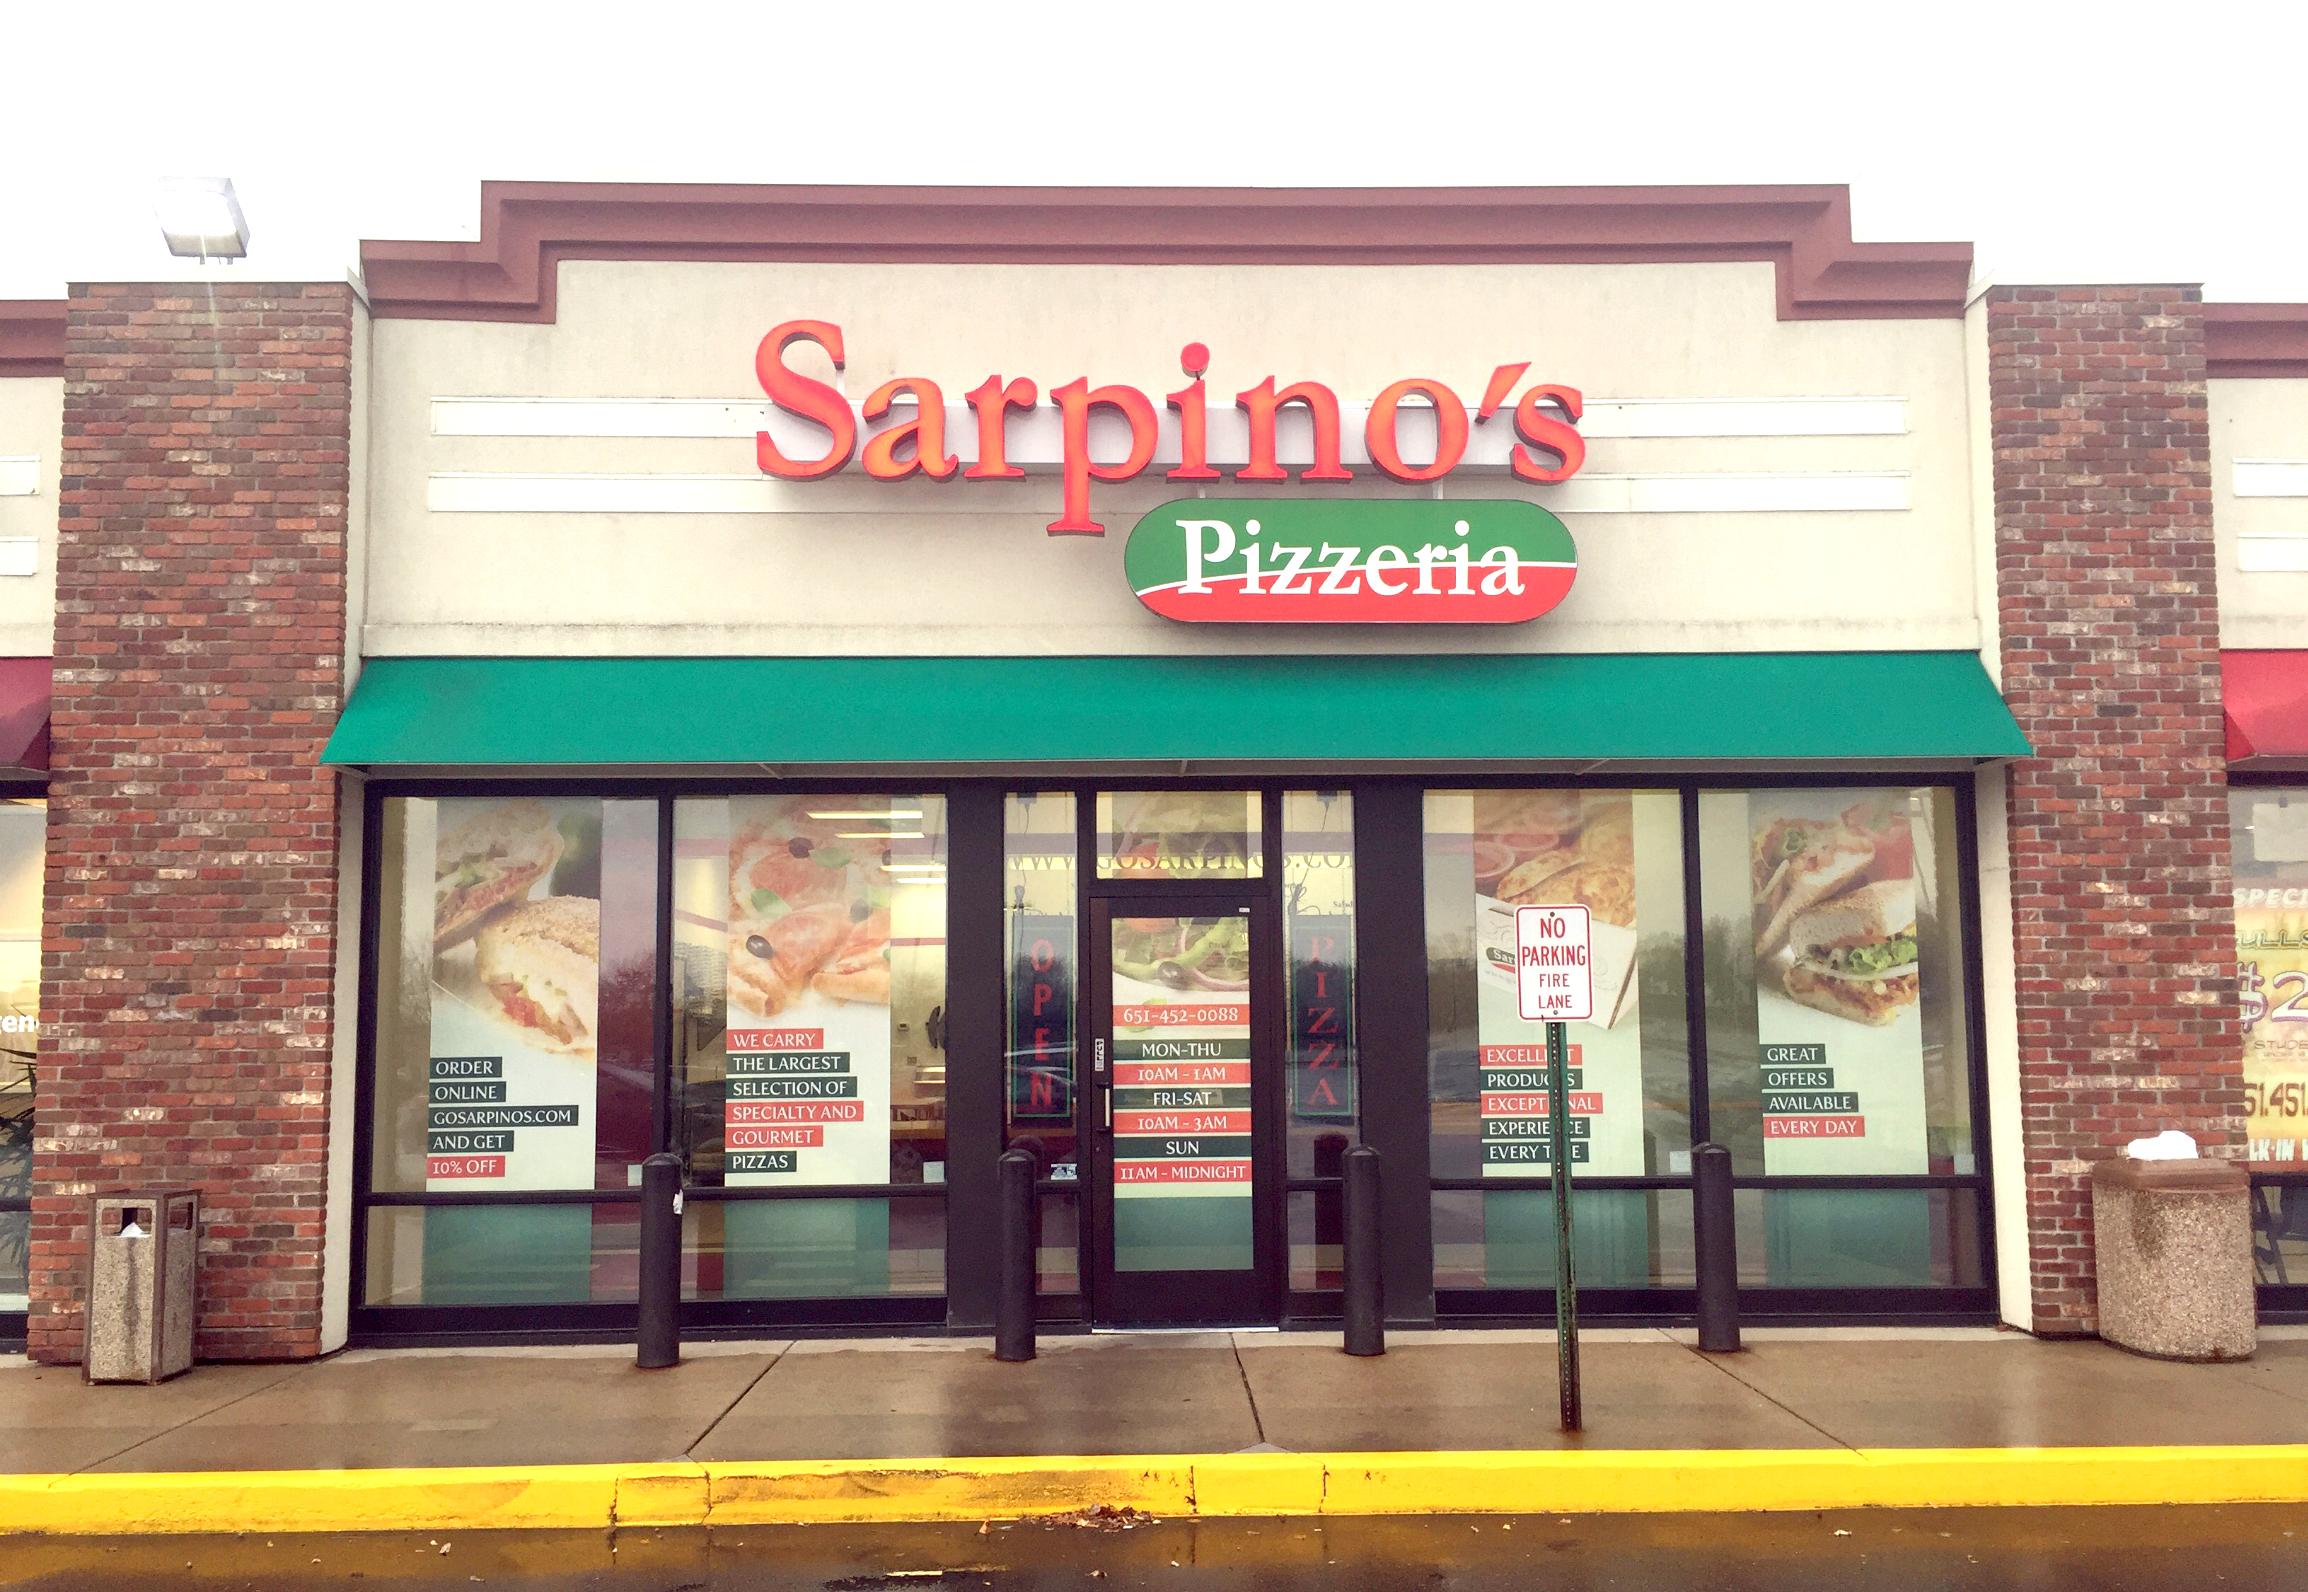 Own a Pizzeria Franchise Sarpino's storefront